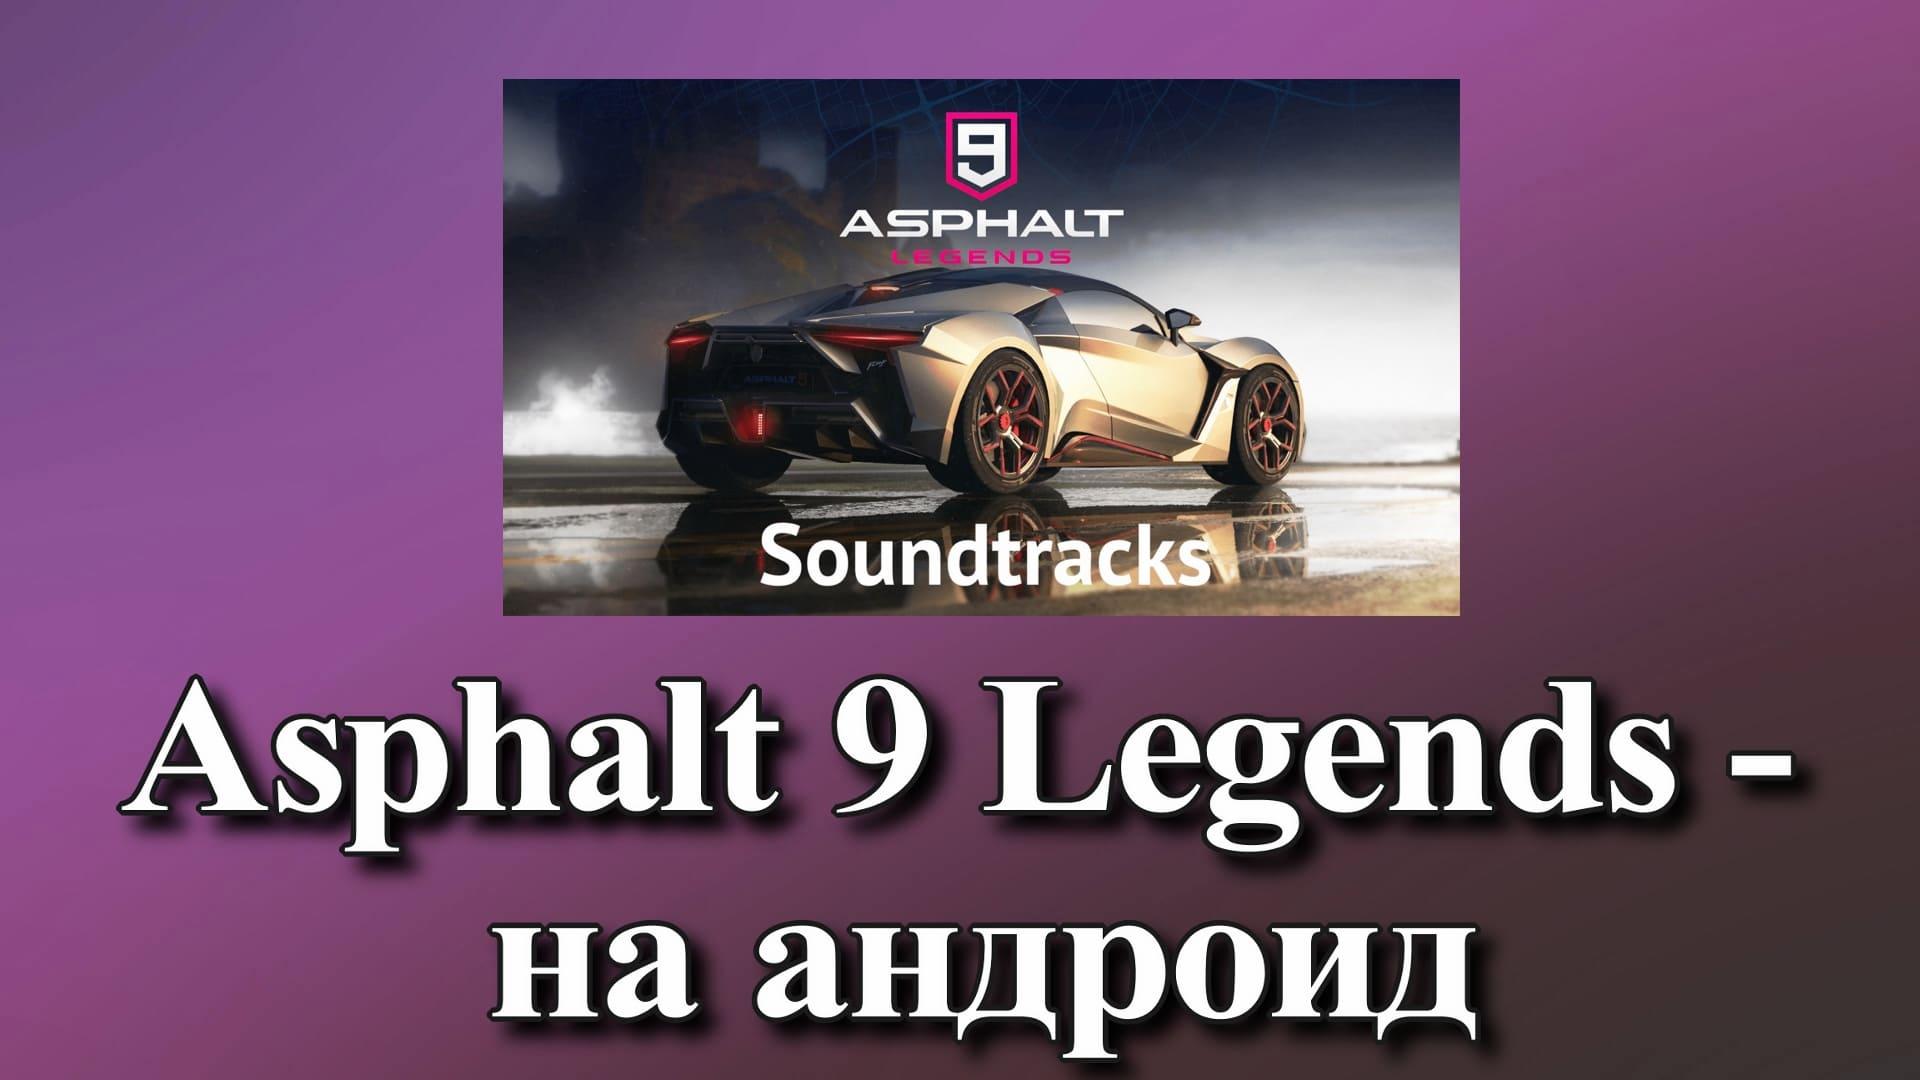 Asphalt 9 Legends - на андроид